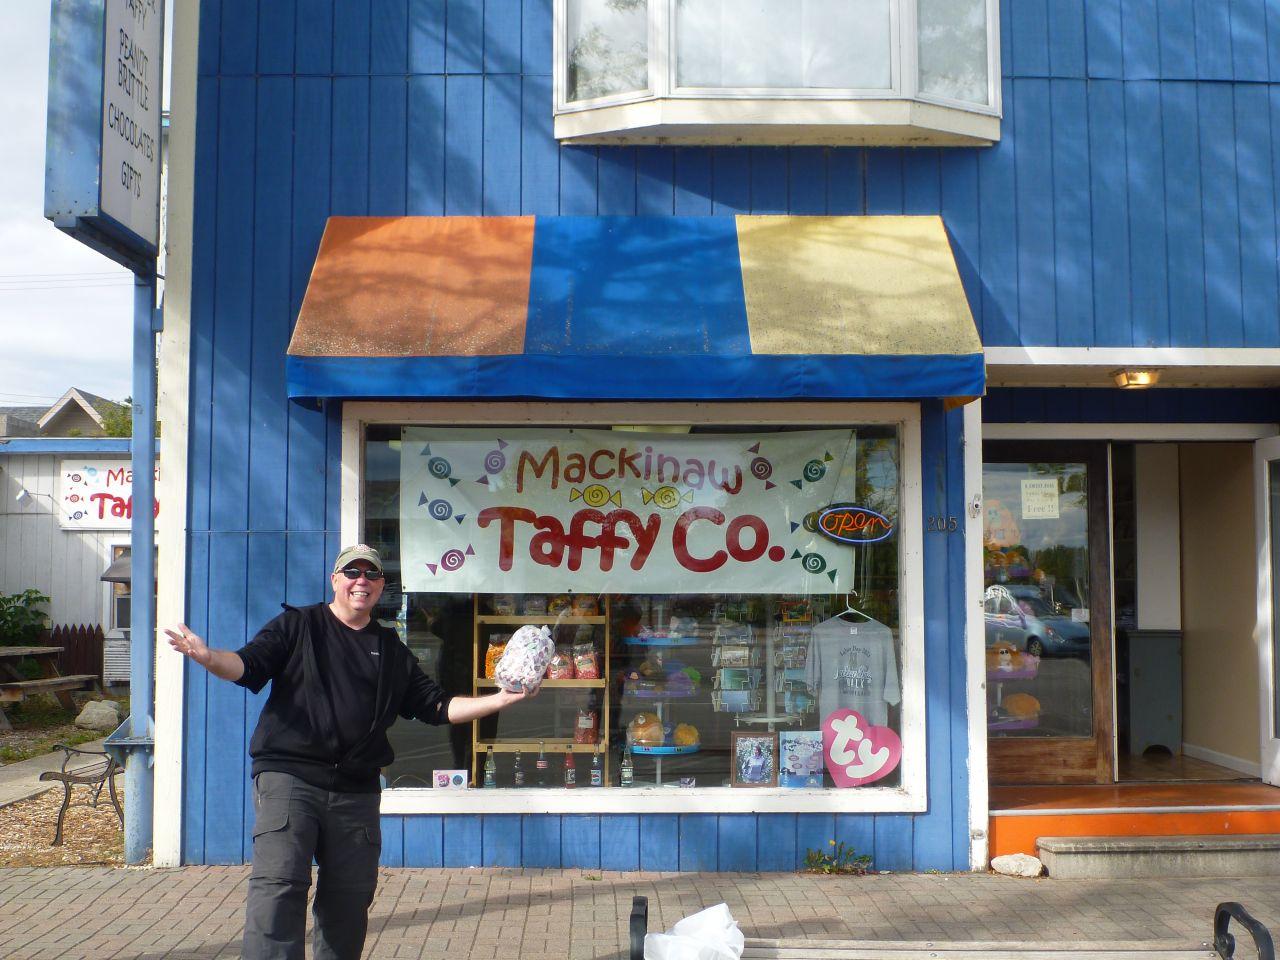 David Found The Taffy Shop!